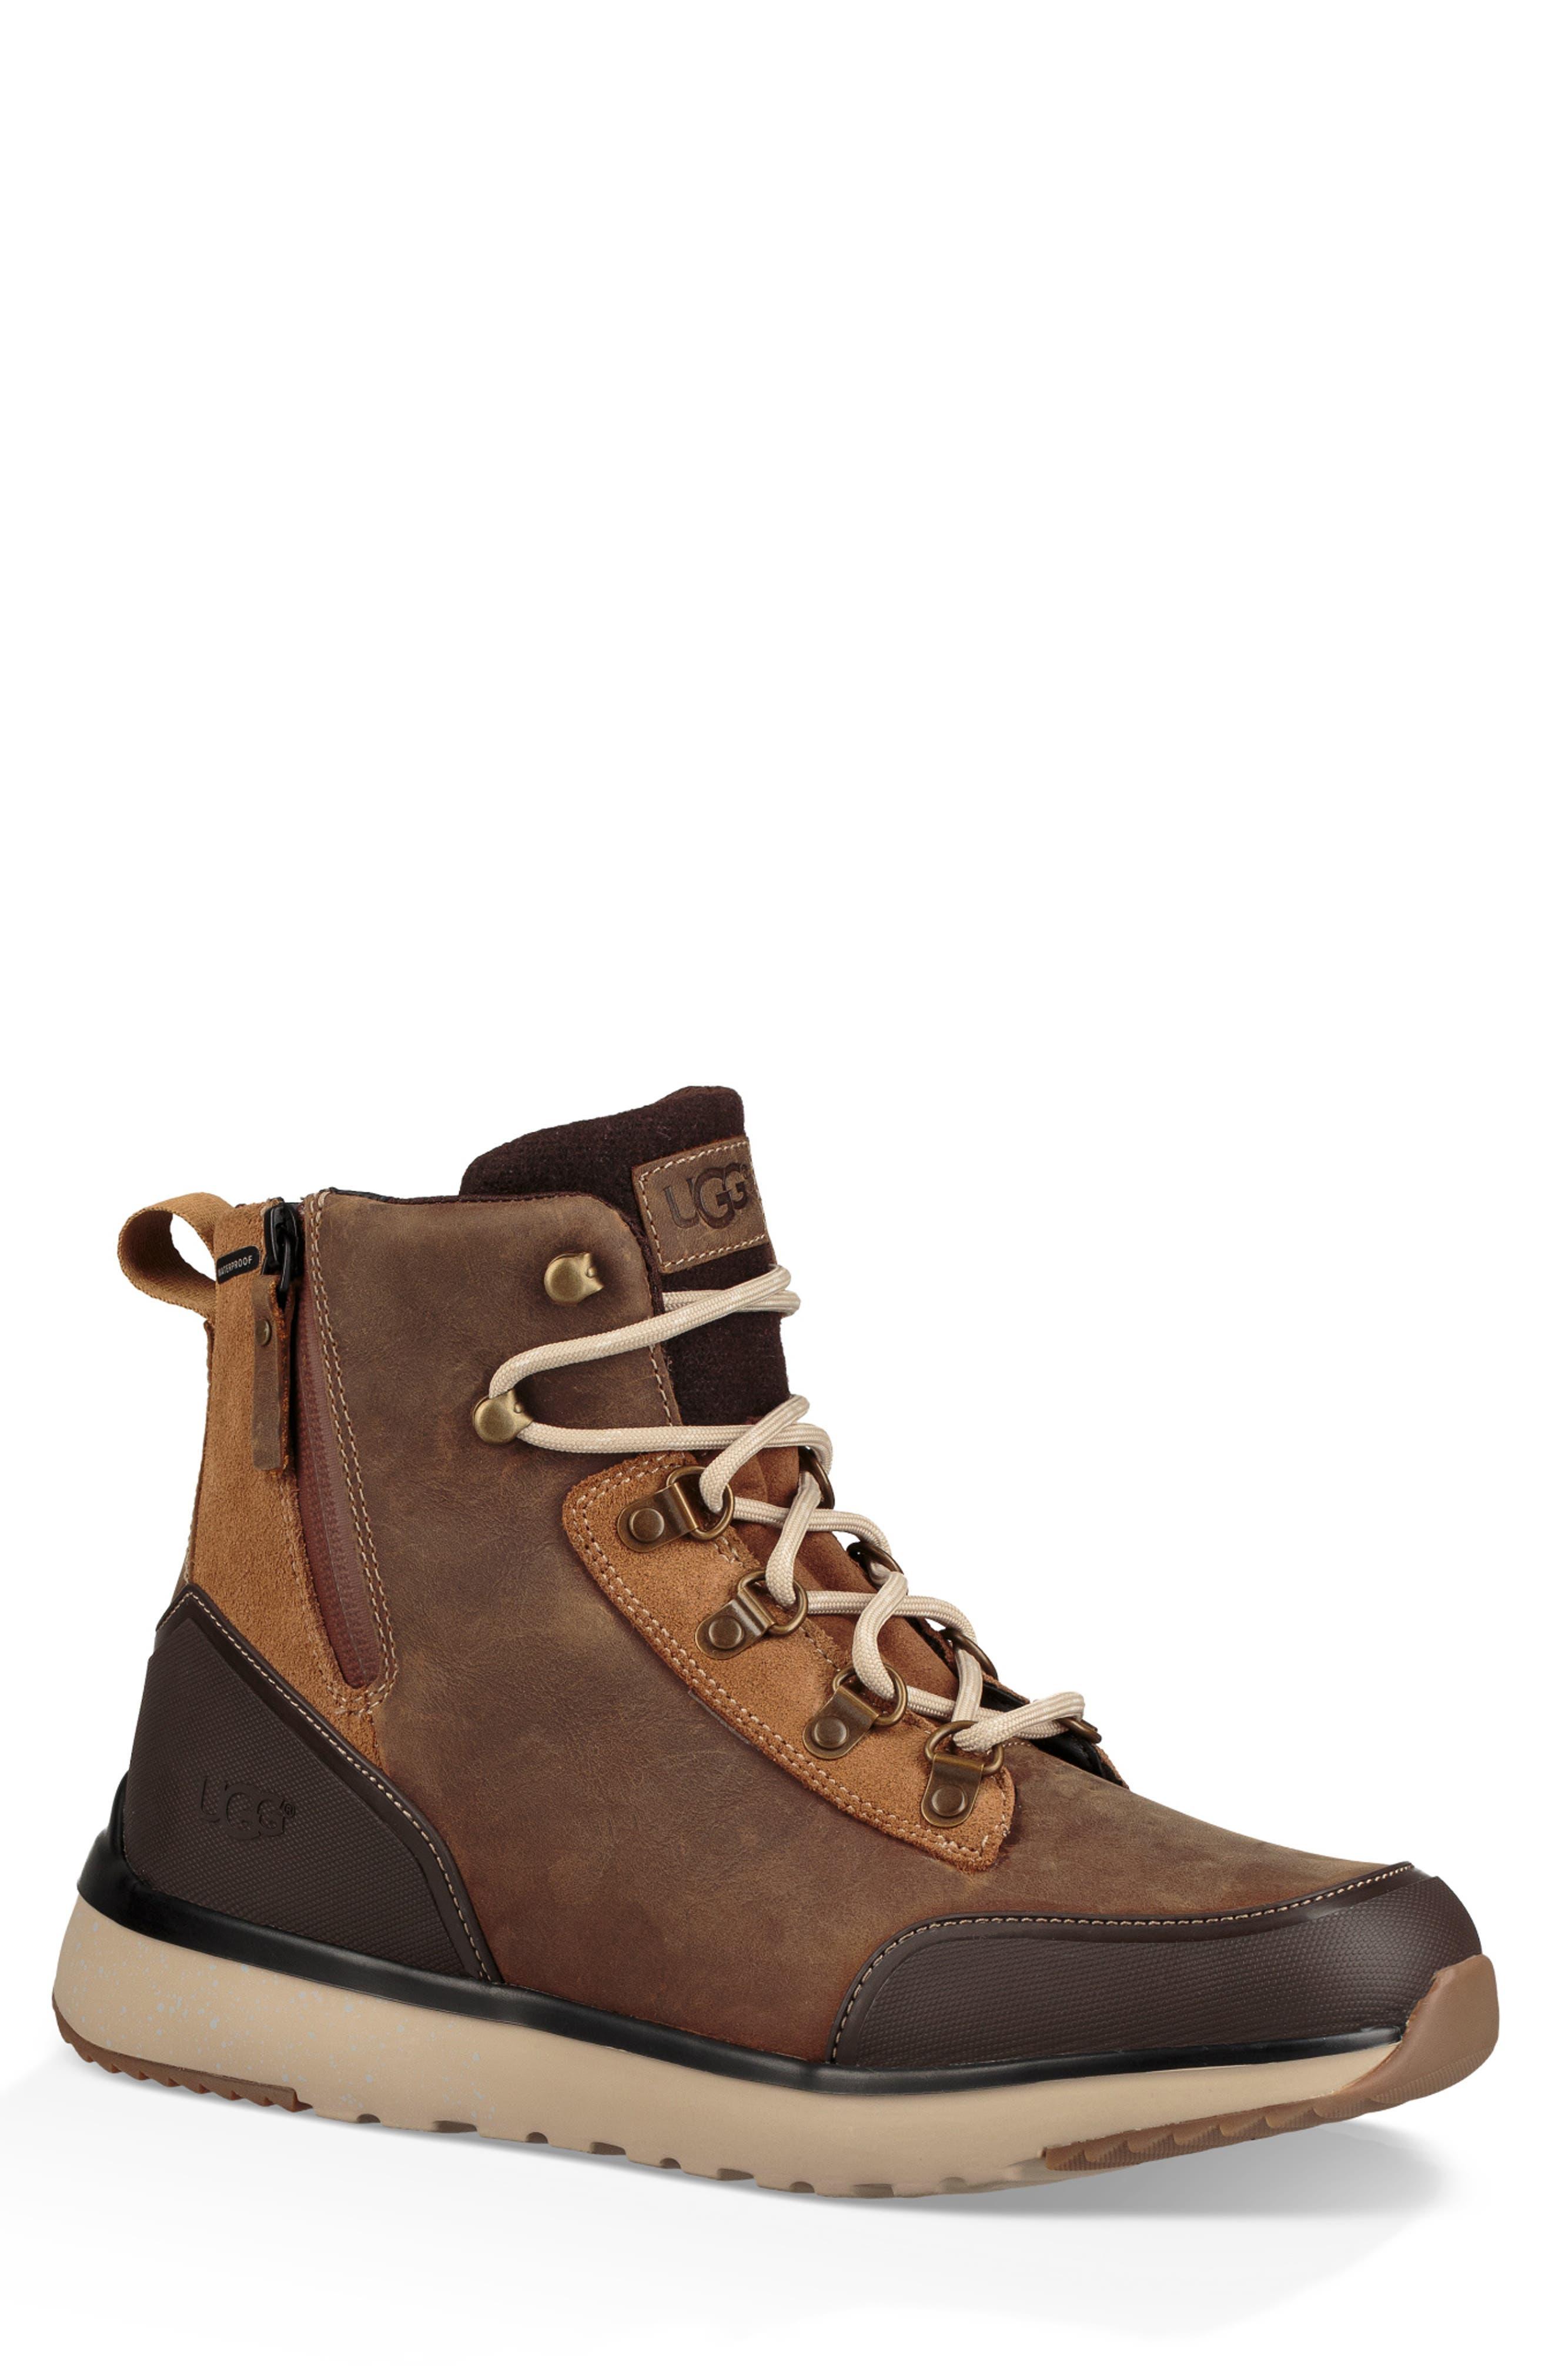 Ugg Caulder Waterproof Boot- Brown